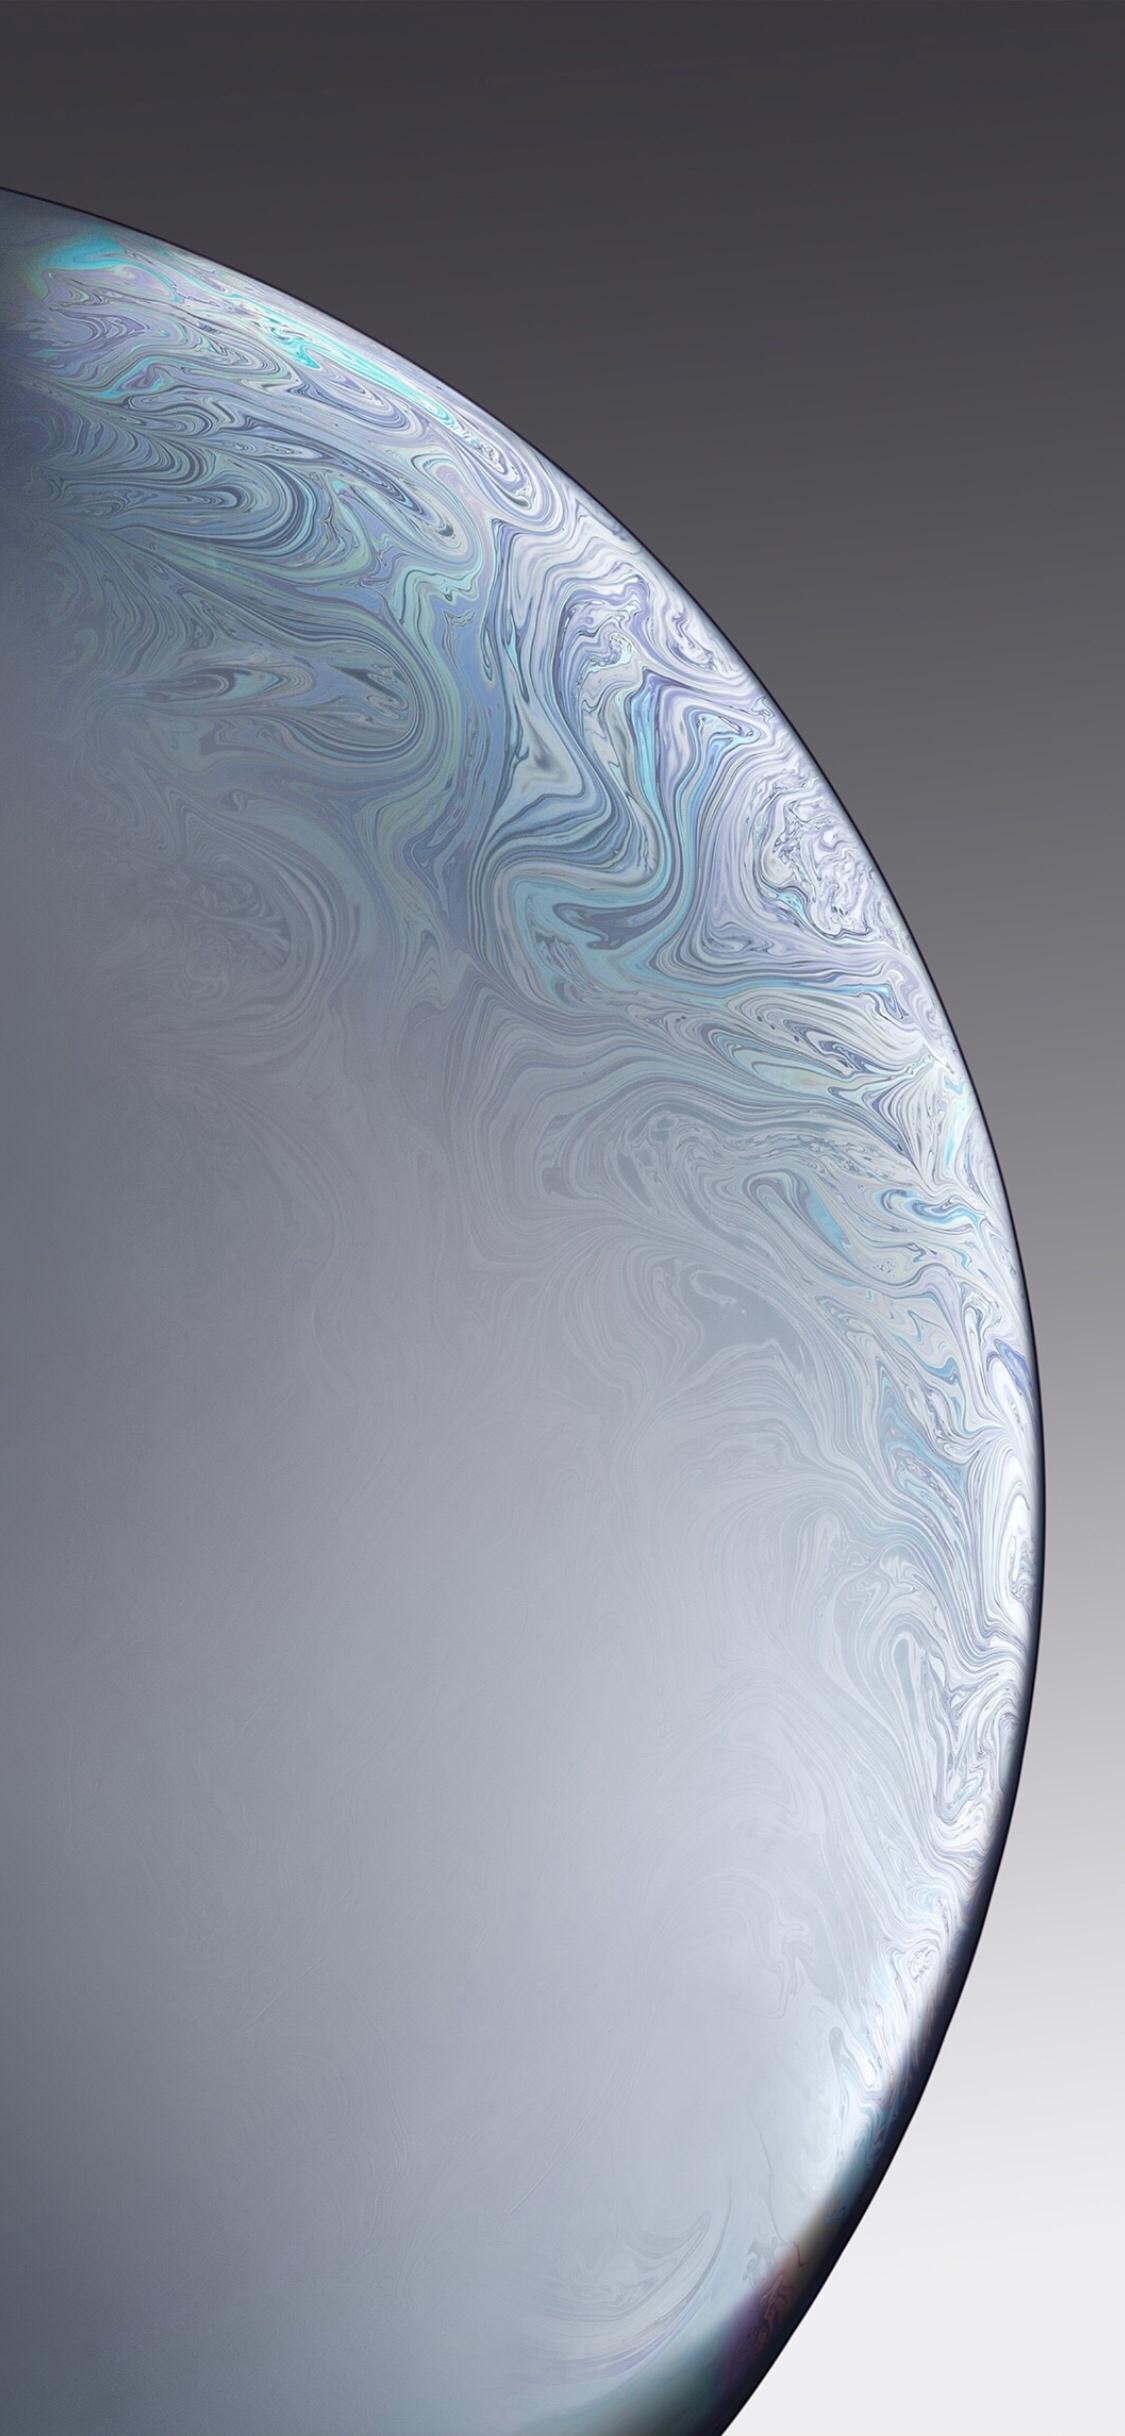 iPhone XR Silver Bubble Wallpaper